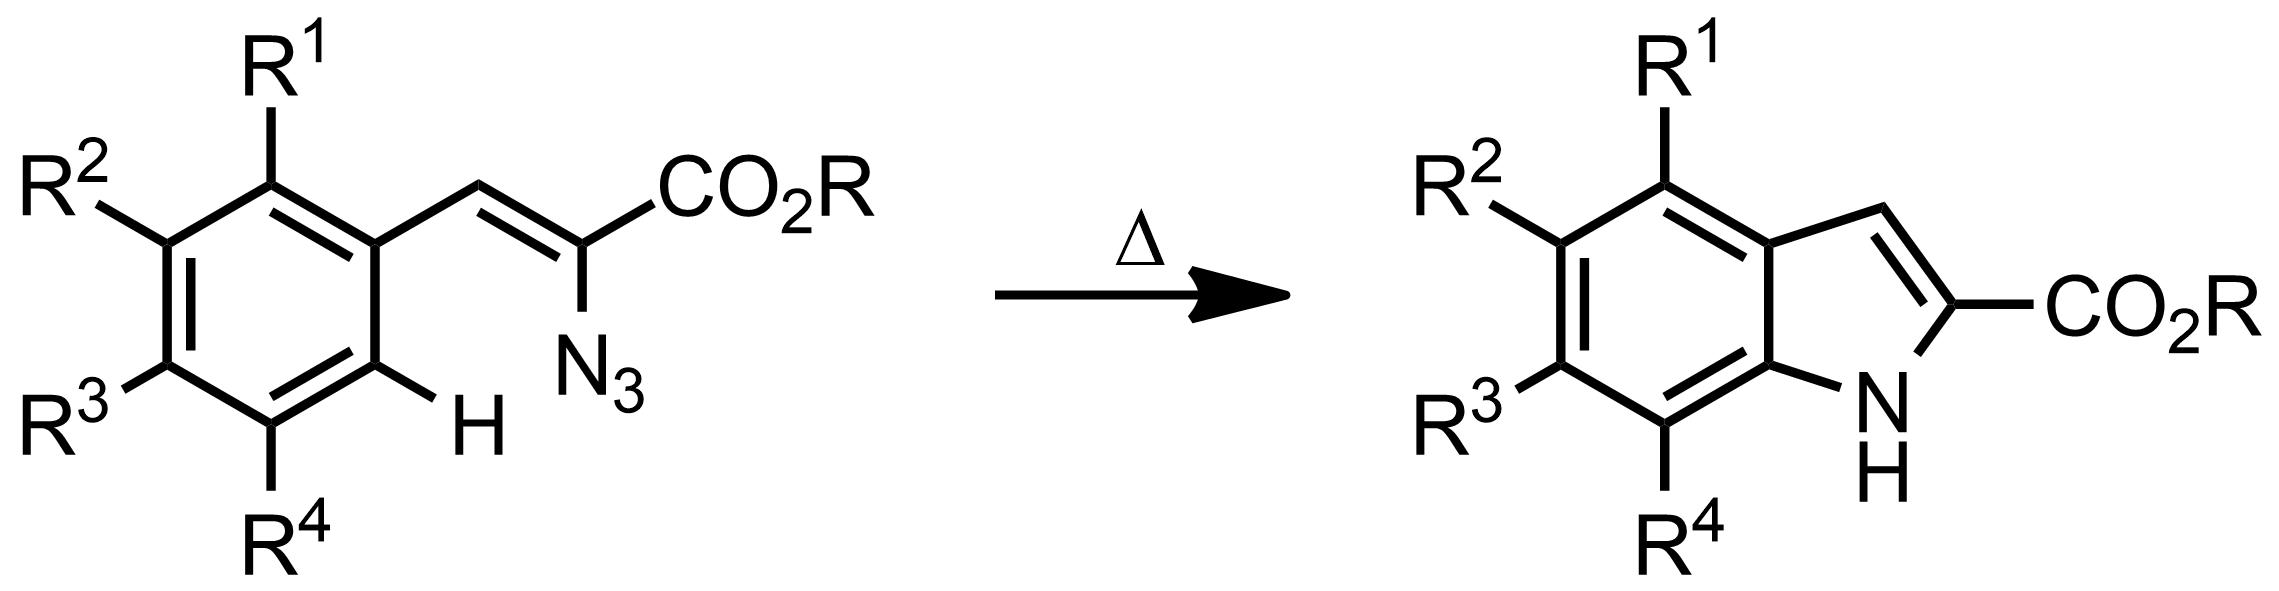 Schematic representation of the Hemetsberger-Knittel Indole Synthesis.